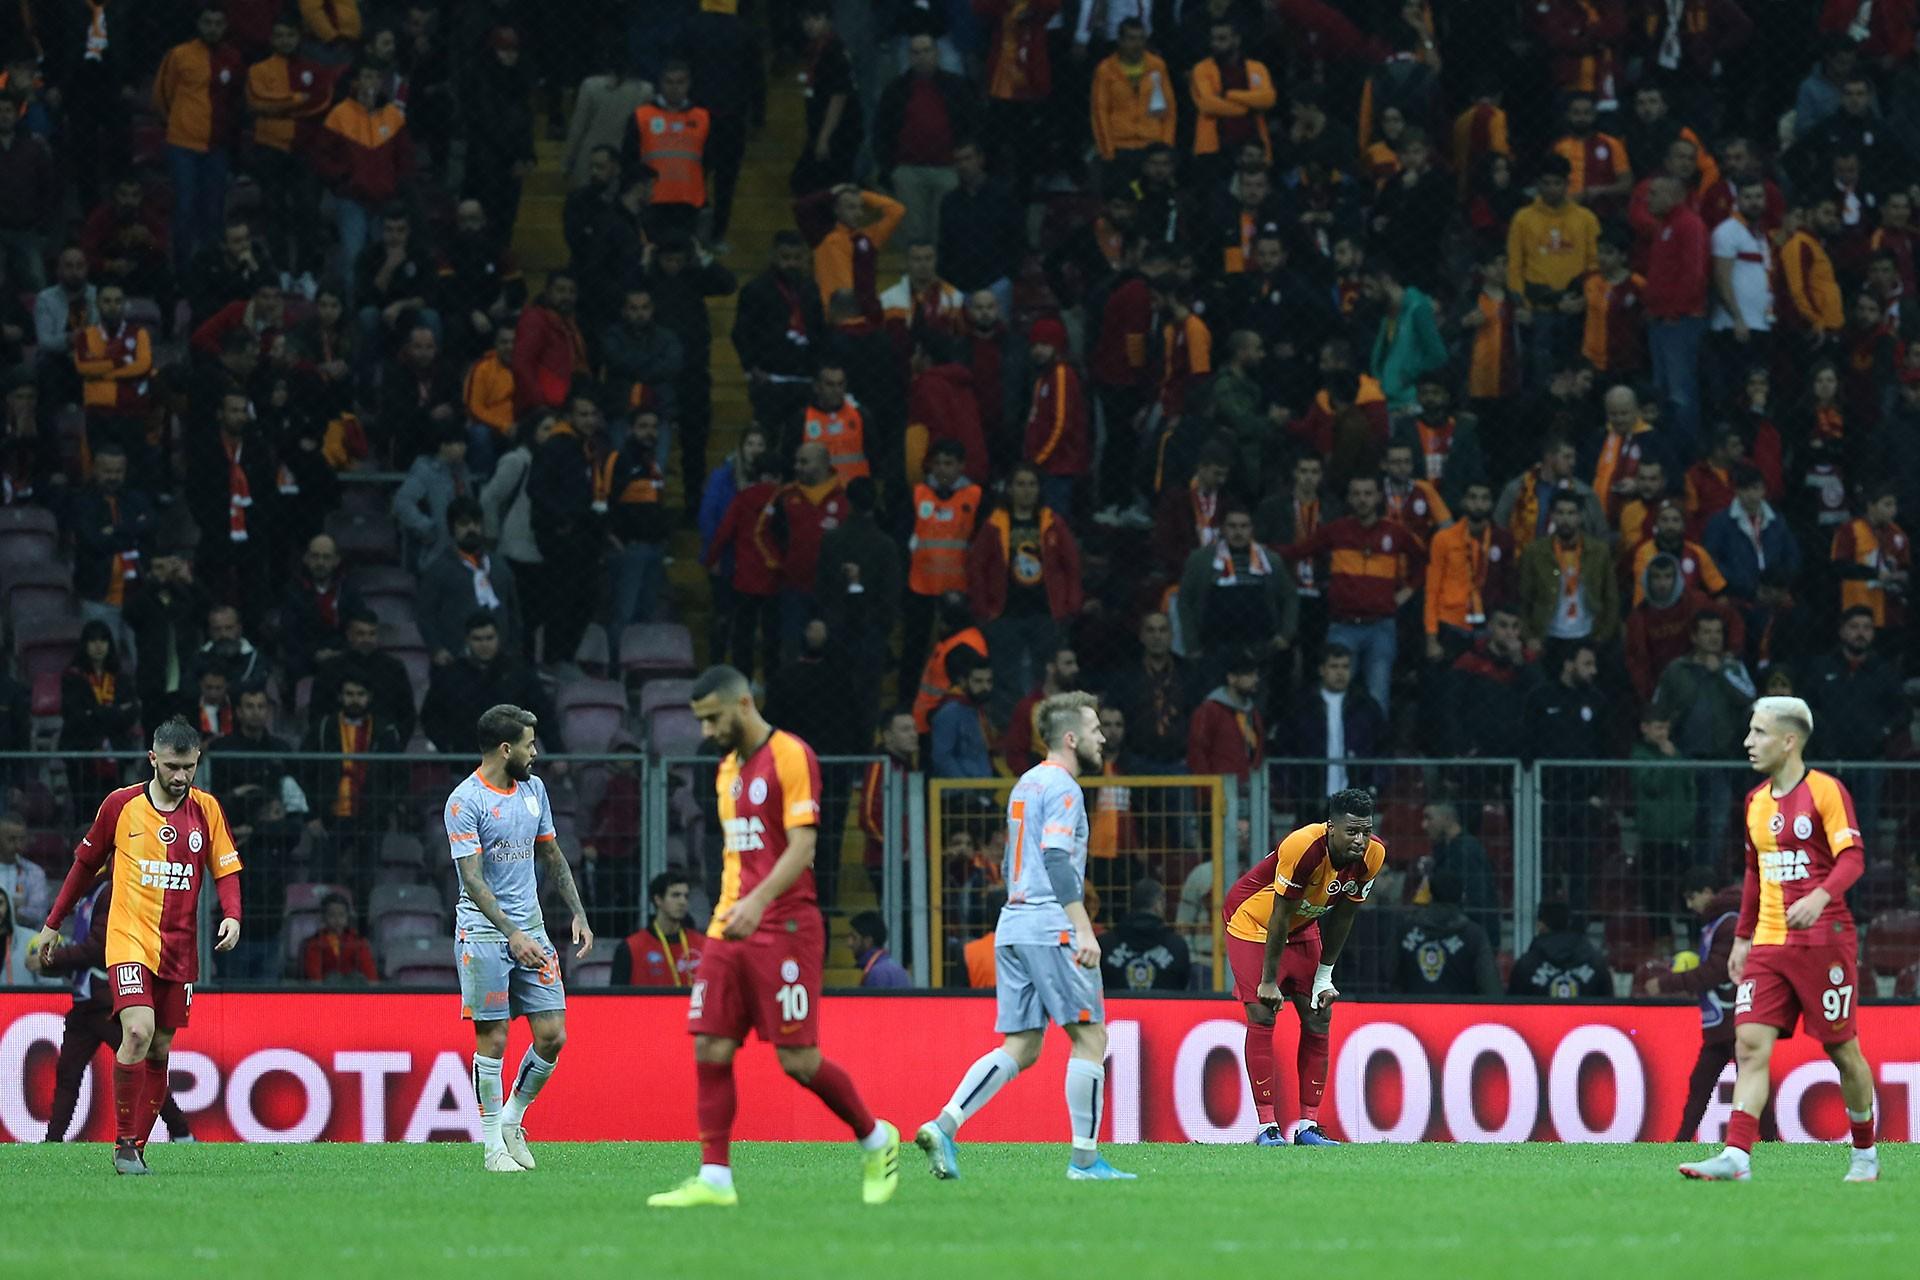 Galatasaray-Başakşehir maçı